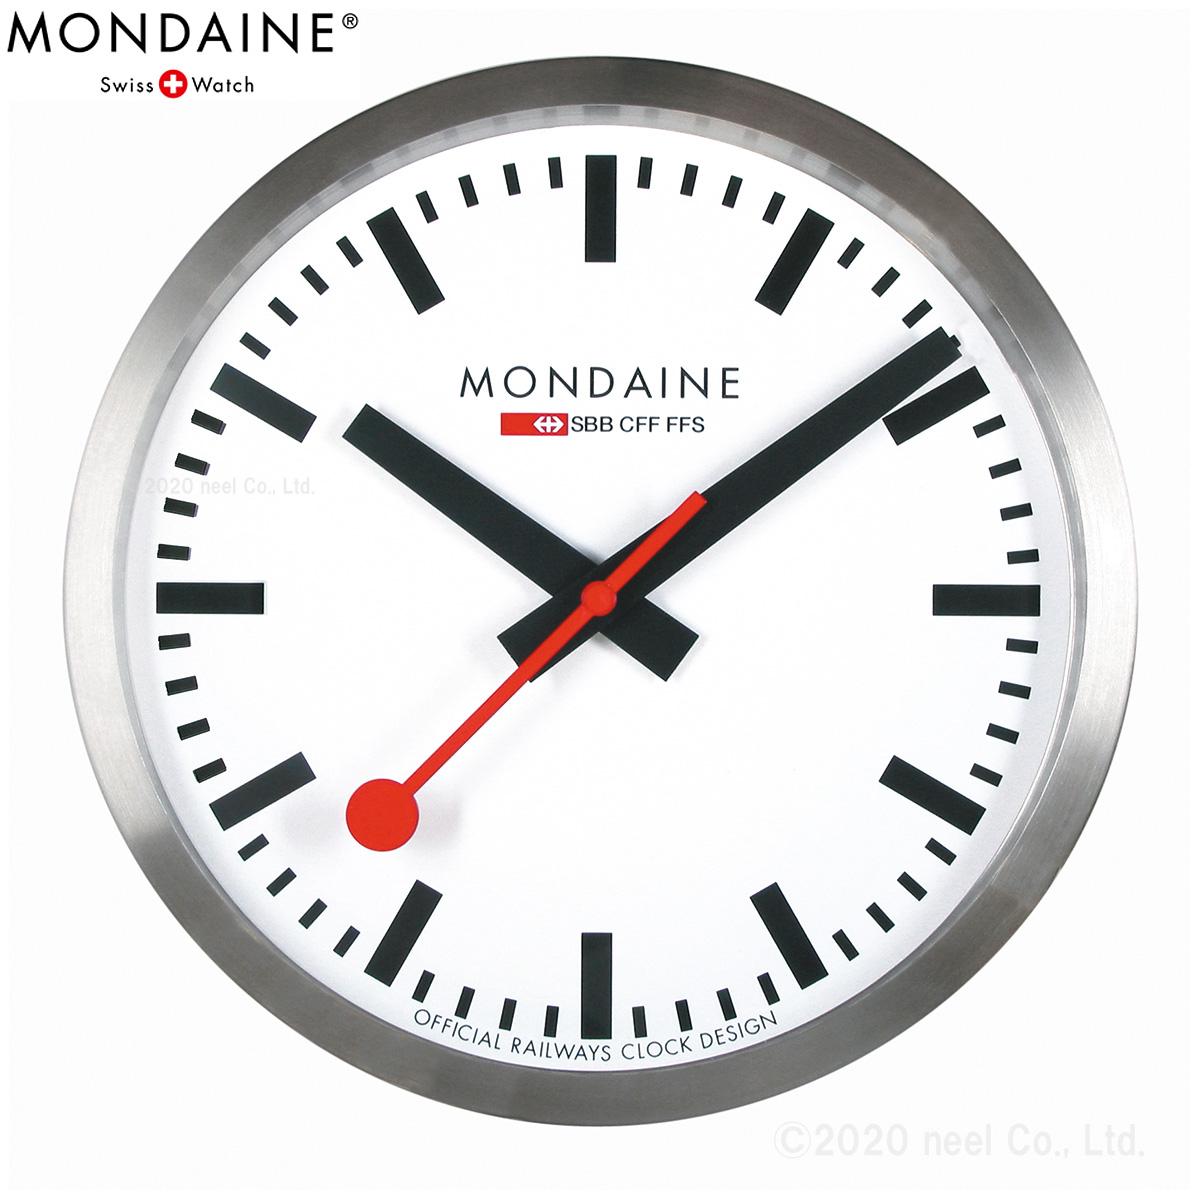 【SHOP OF THE YEAR 2018 受賞】モンディーン MONDAINE ウォール クロック Wall Clock 40cm A995.CLOCK.16SBB